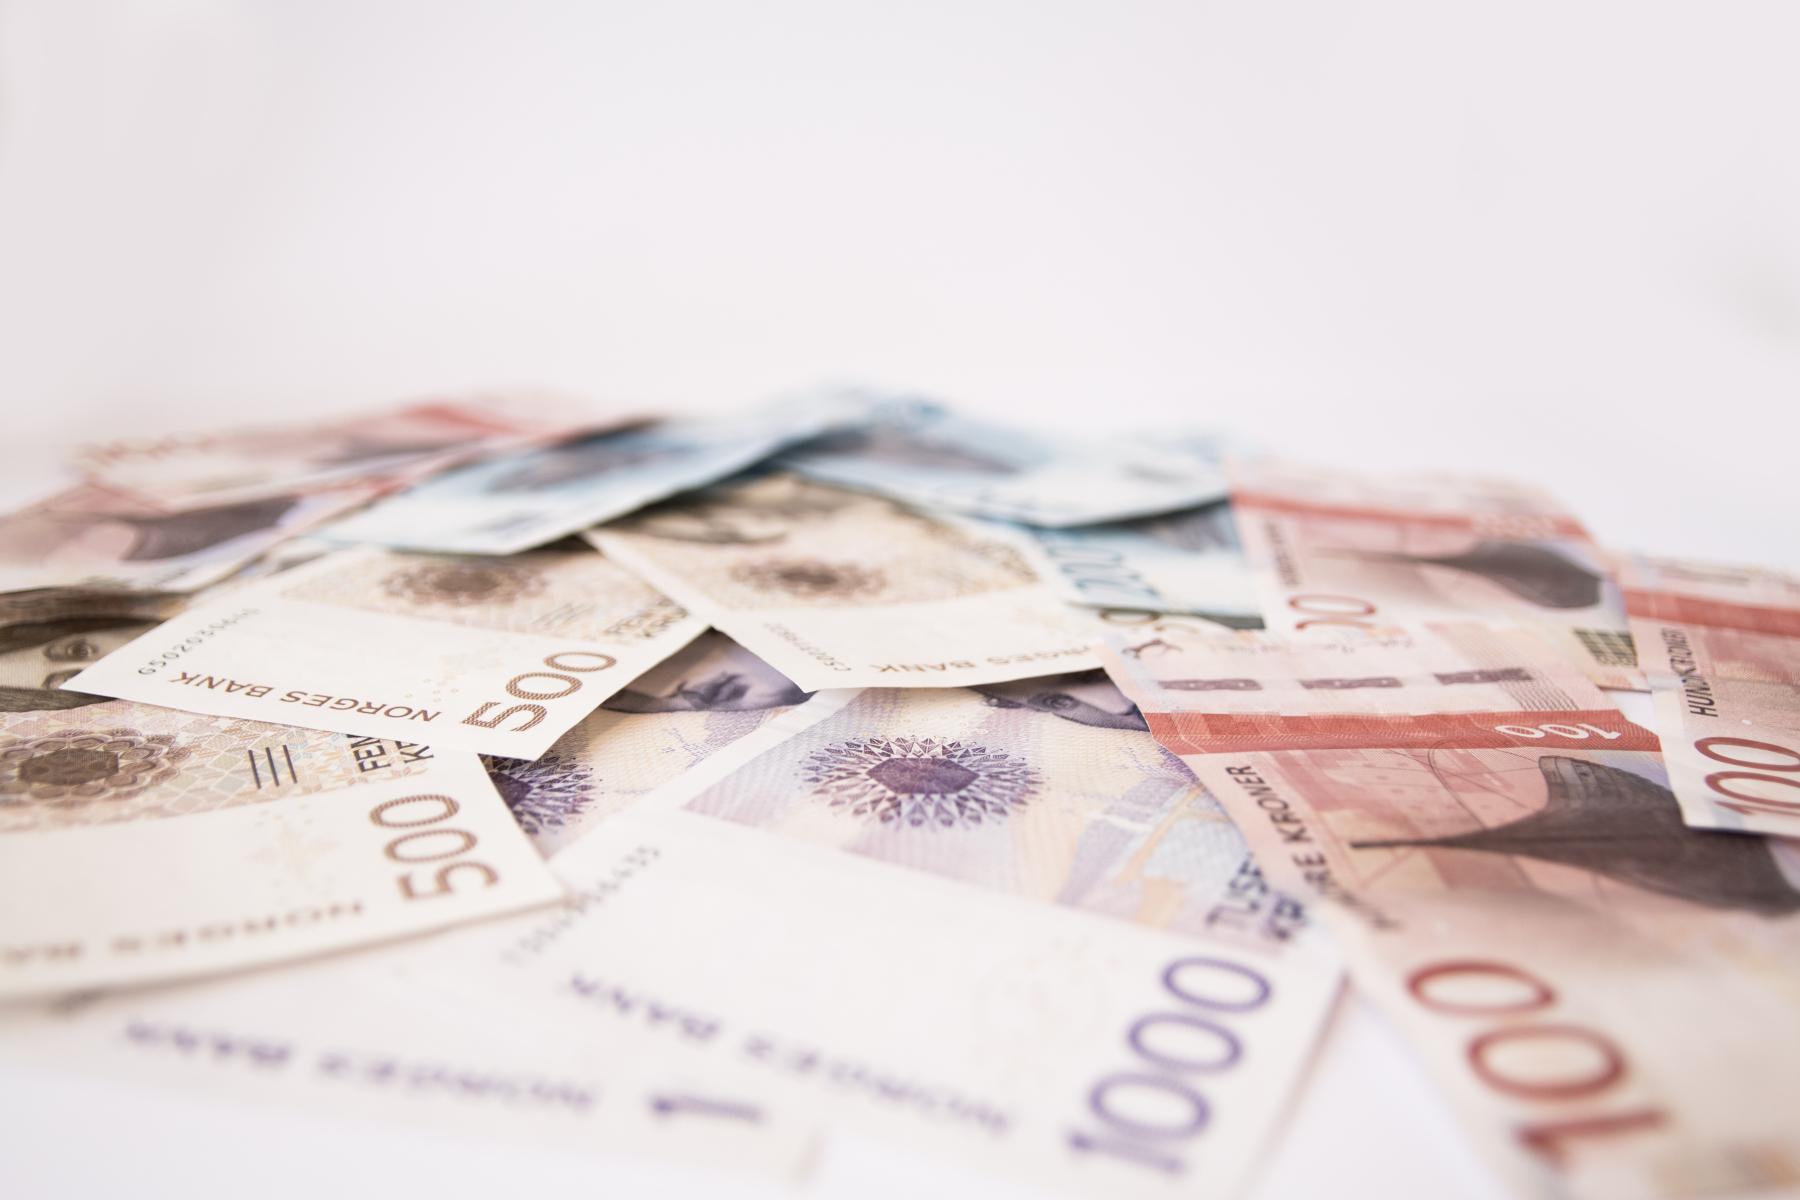 Norske pengeseddler i ein haug